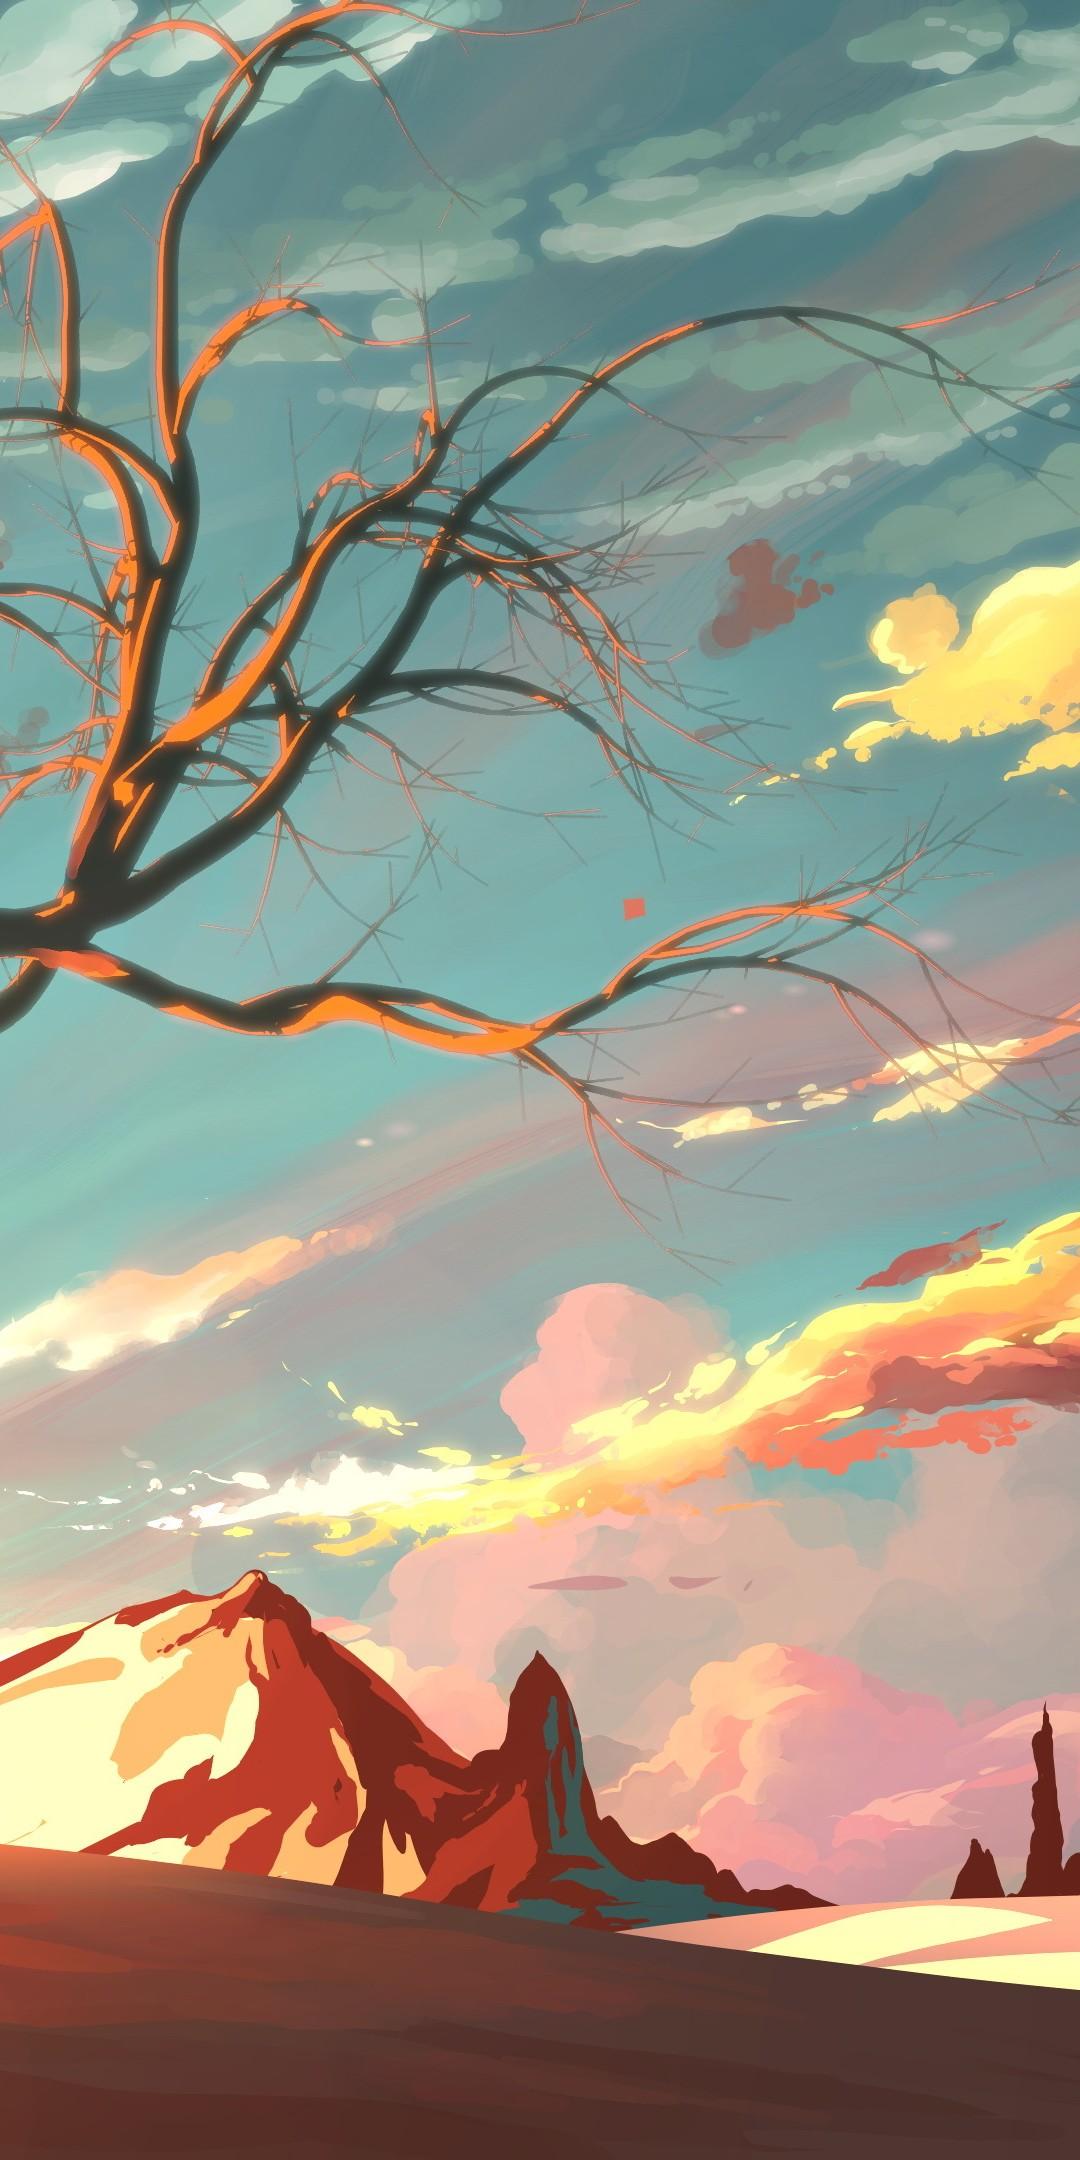 Iphone X Wallpaper For Note 8 Artistic Landscape Wallpaper 1080x2160